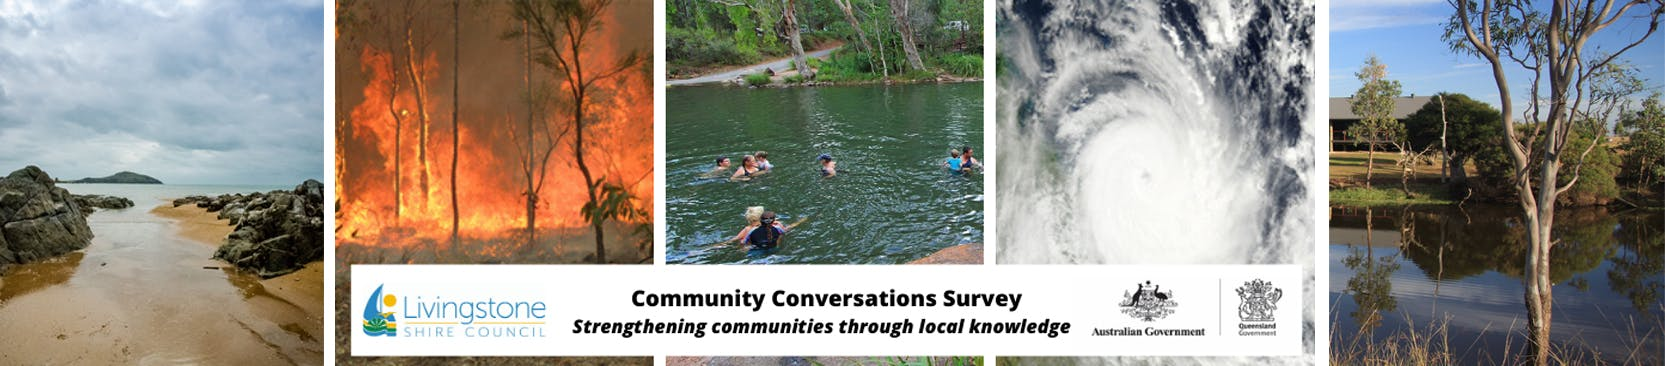 Community Conversations Survey